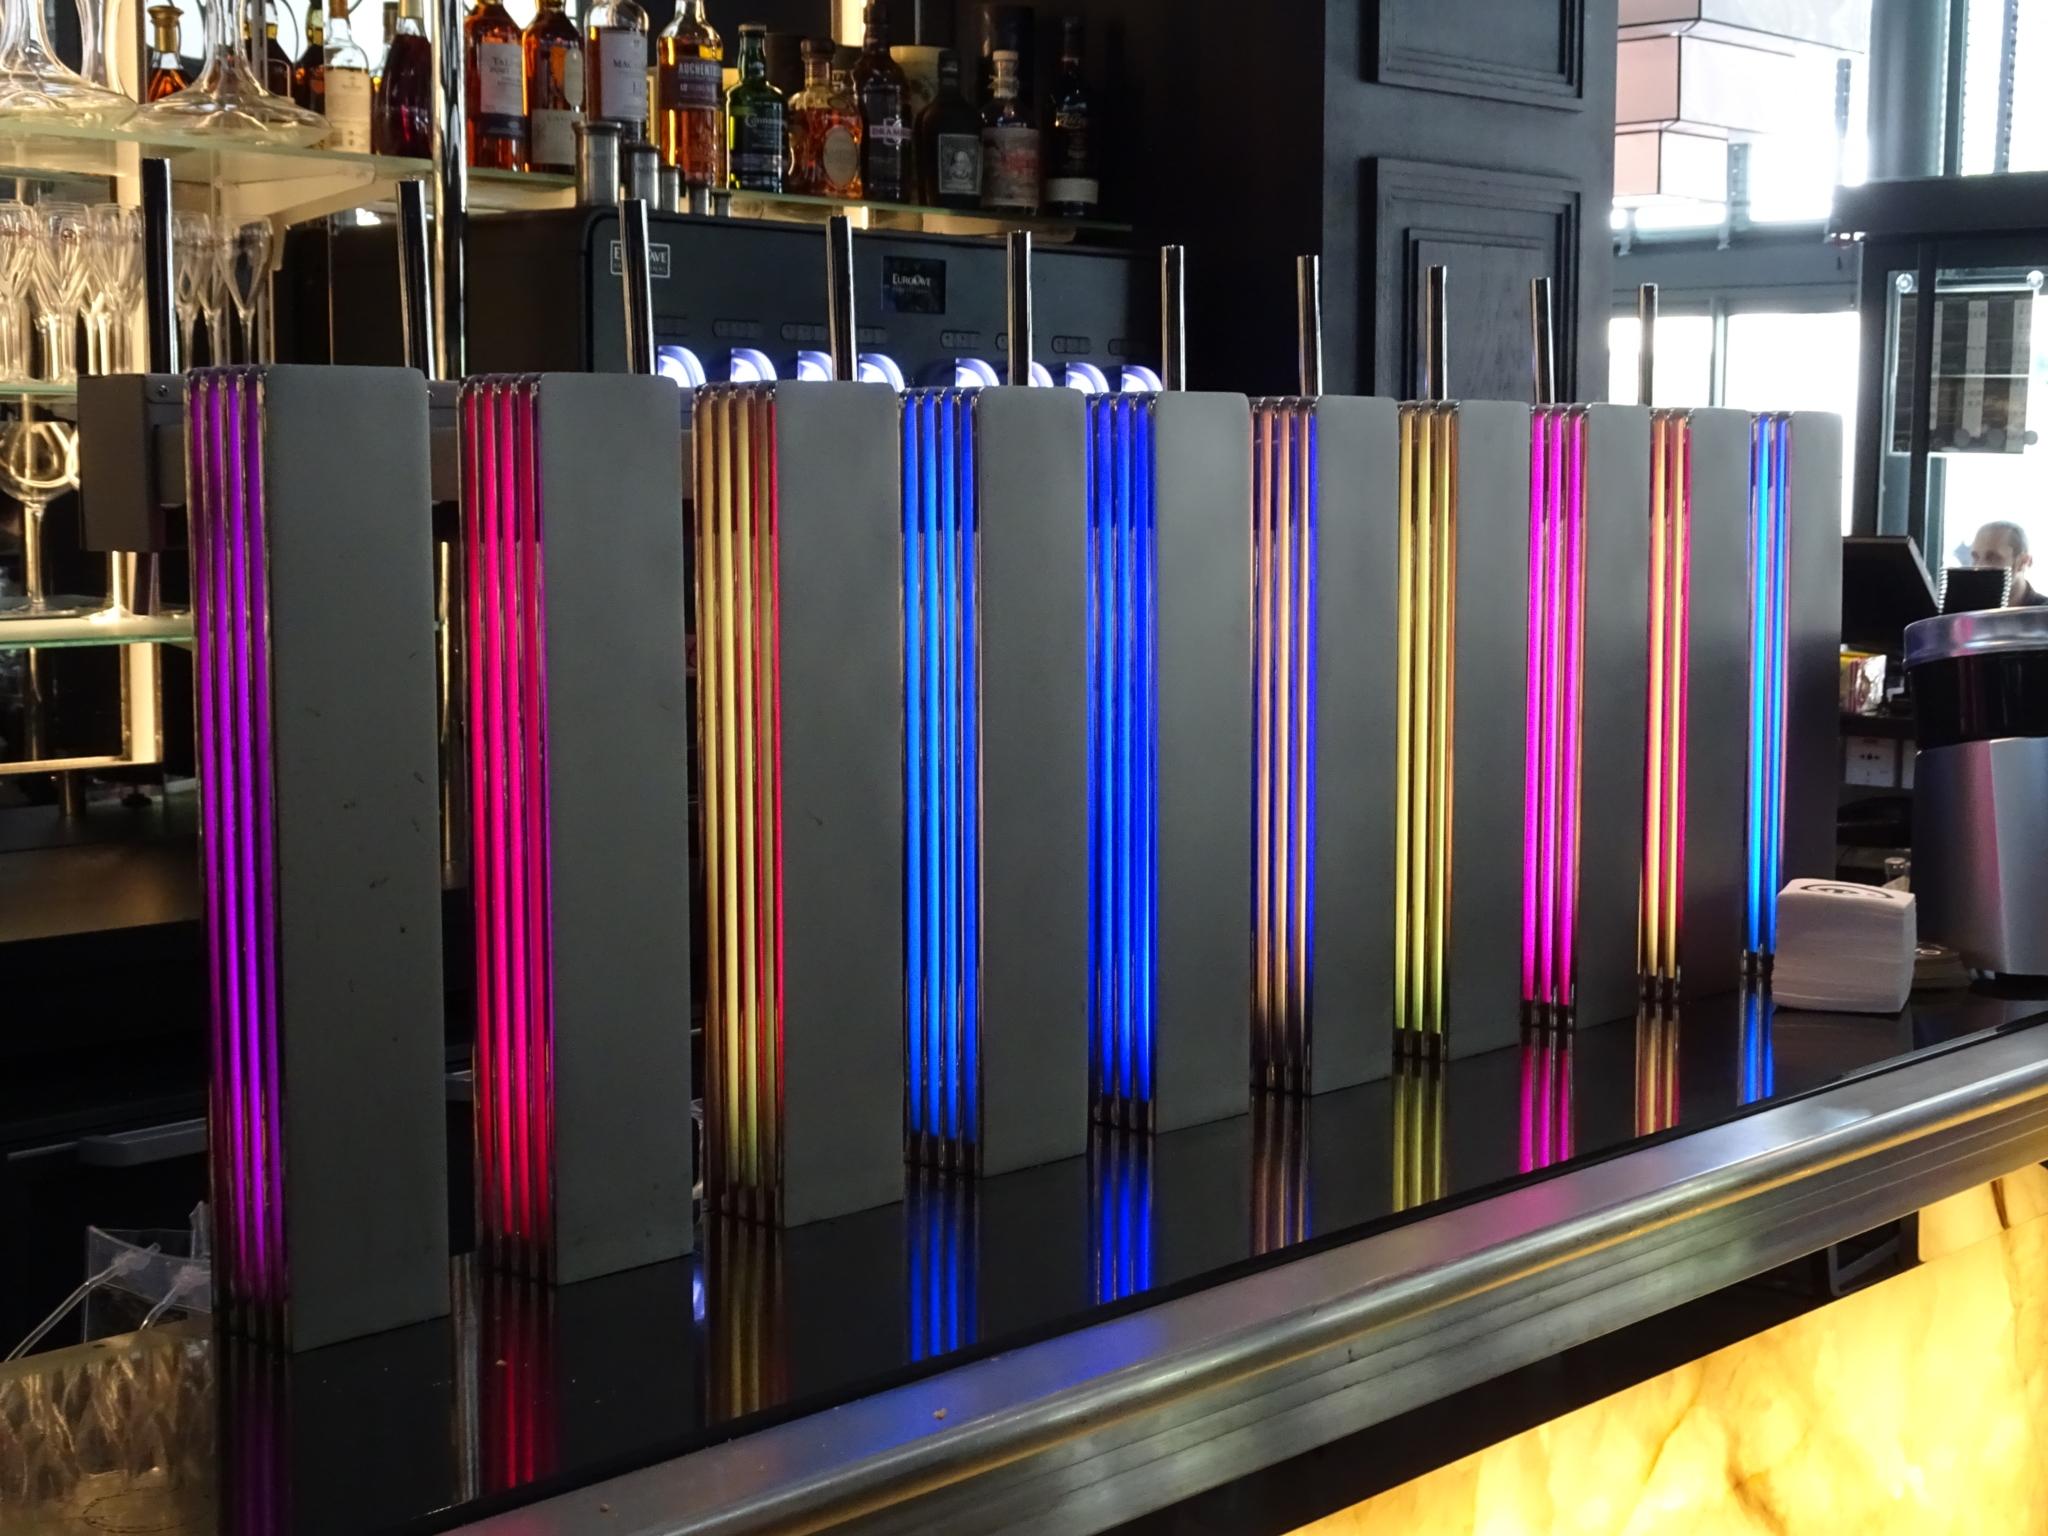 tirador-iluma-Aplimet-sirve-cervezas-restaurante-ledito-dijon